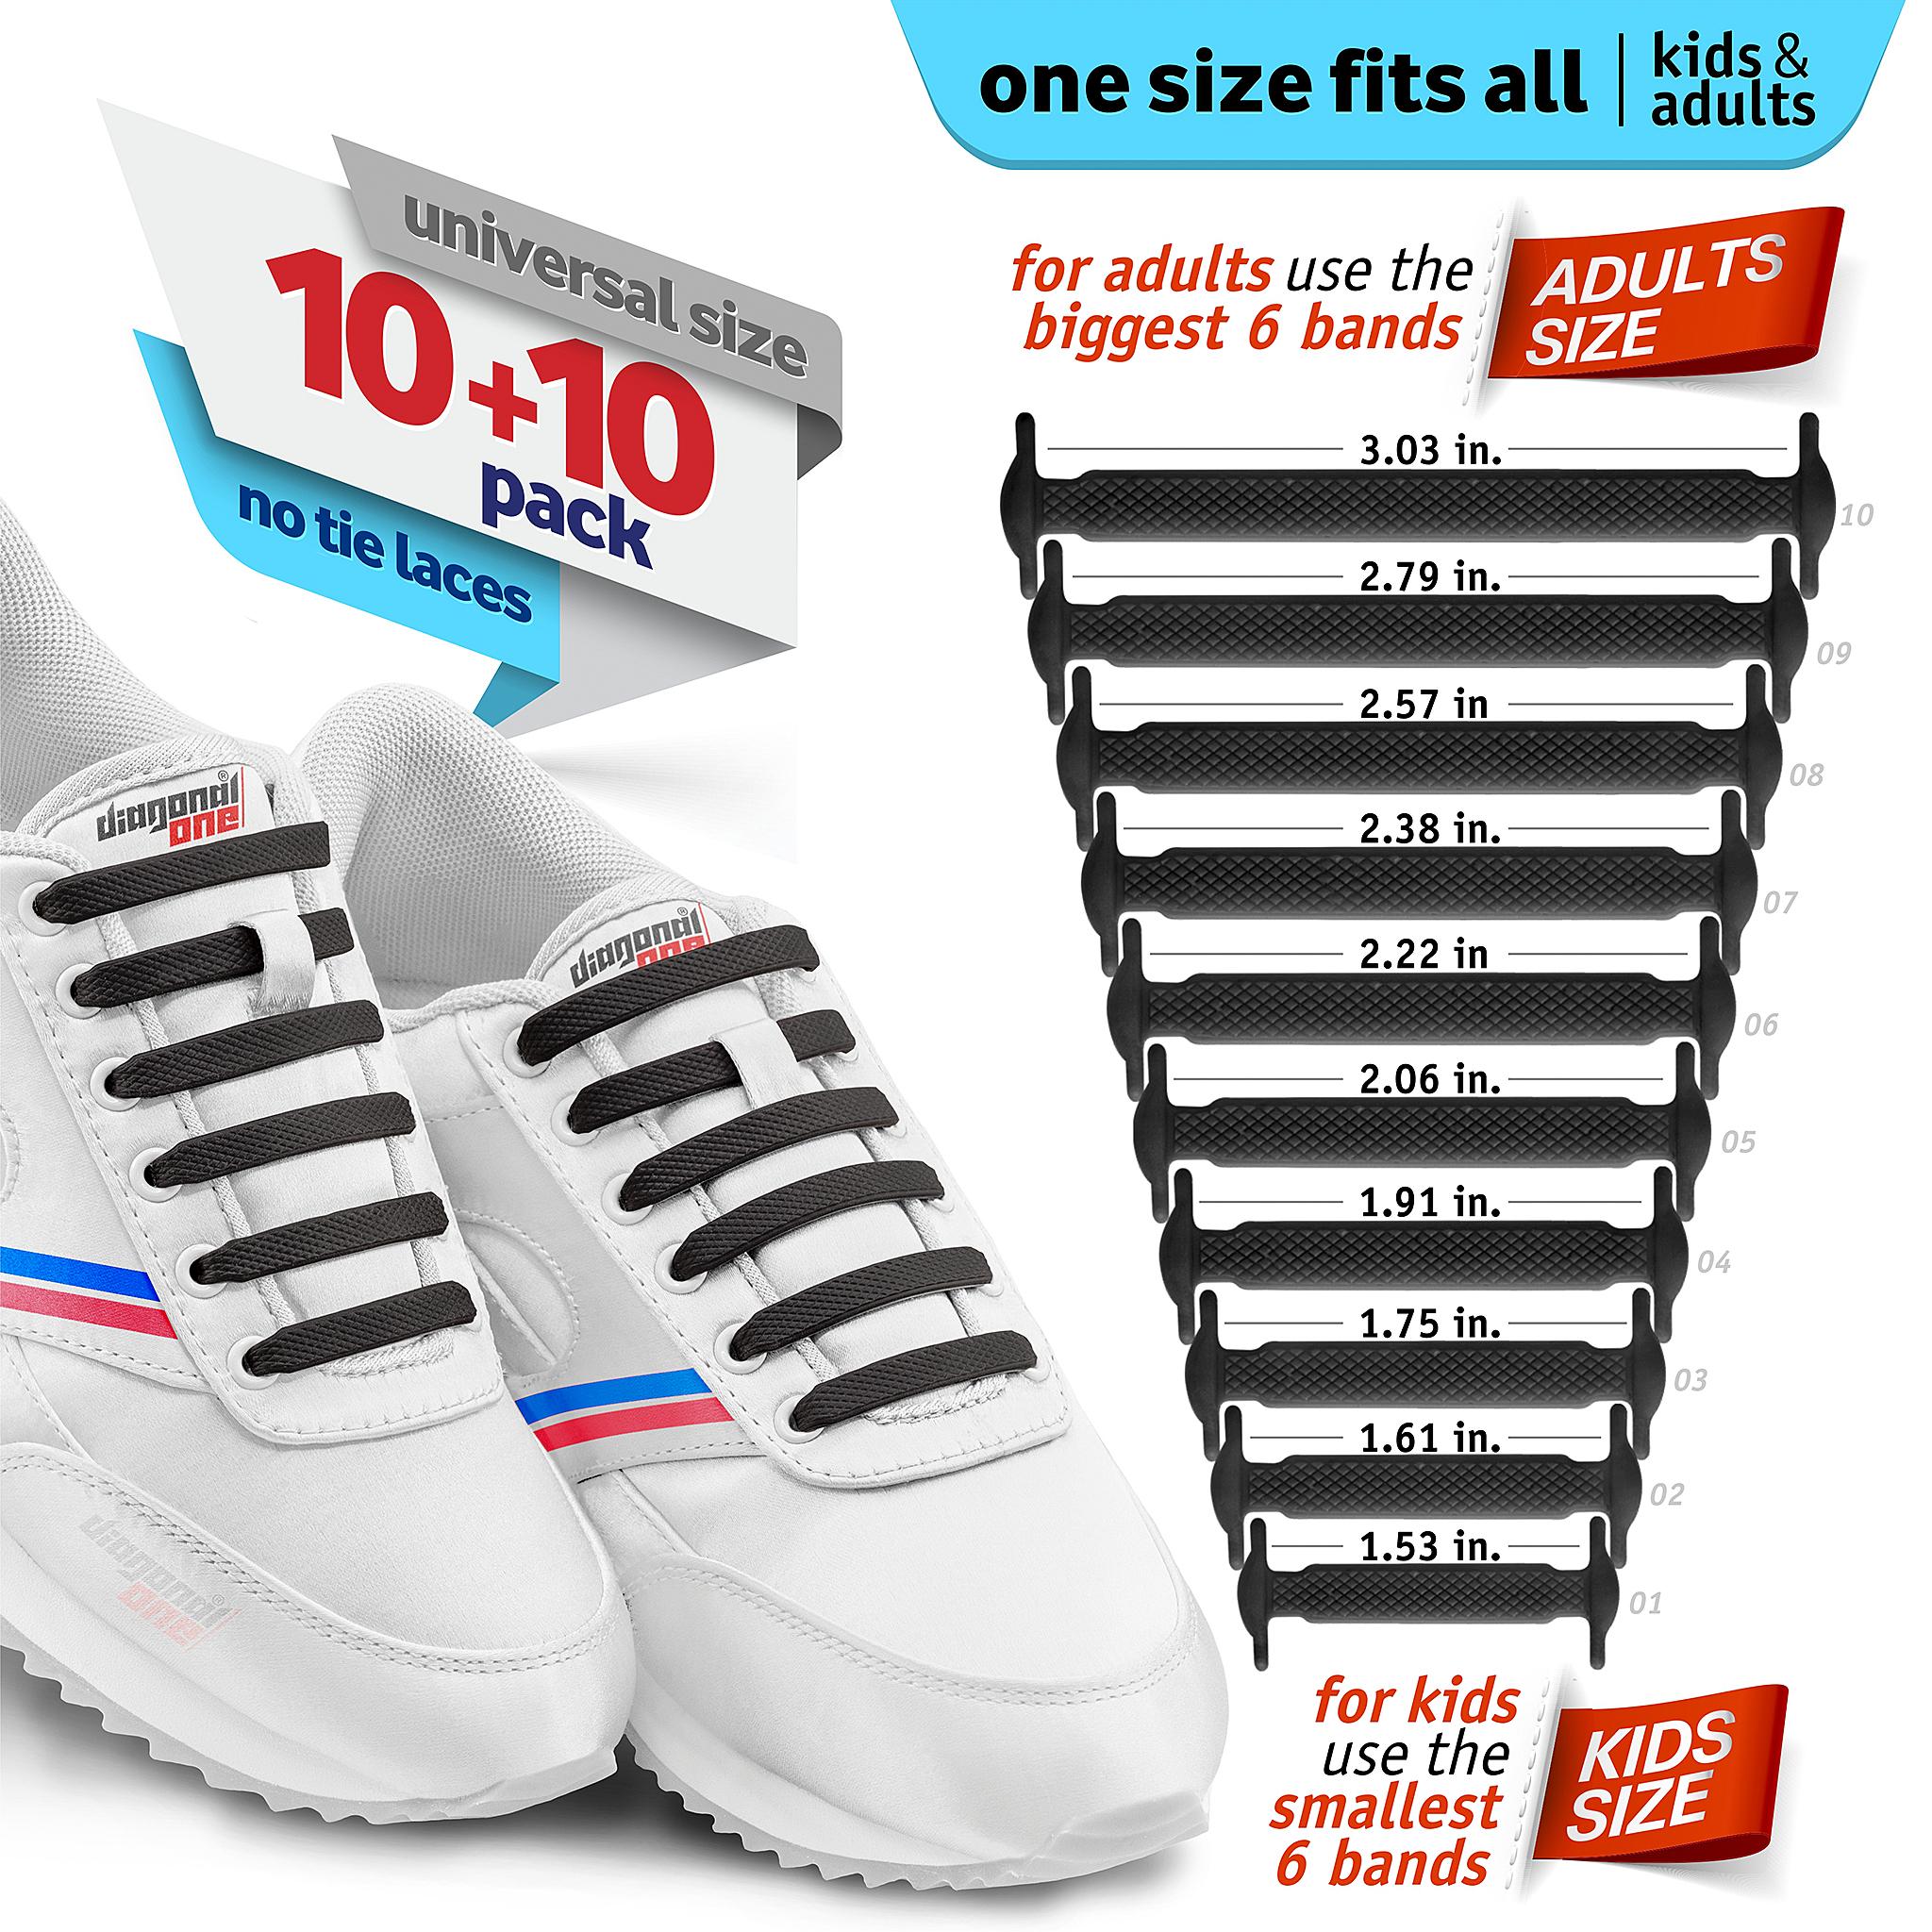 824cca7236566 Products | Diagonal One® / No Tie Shoelaces Evolution